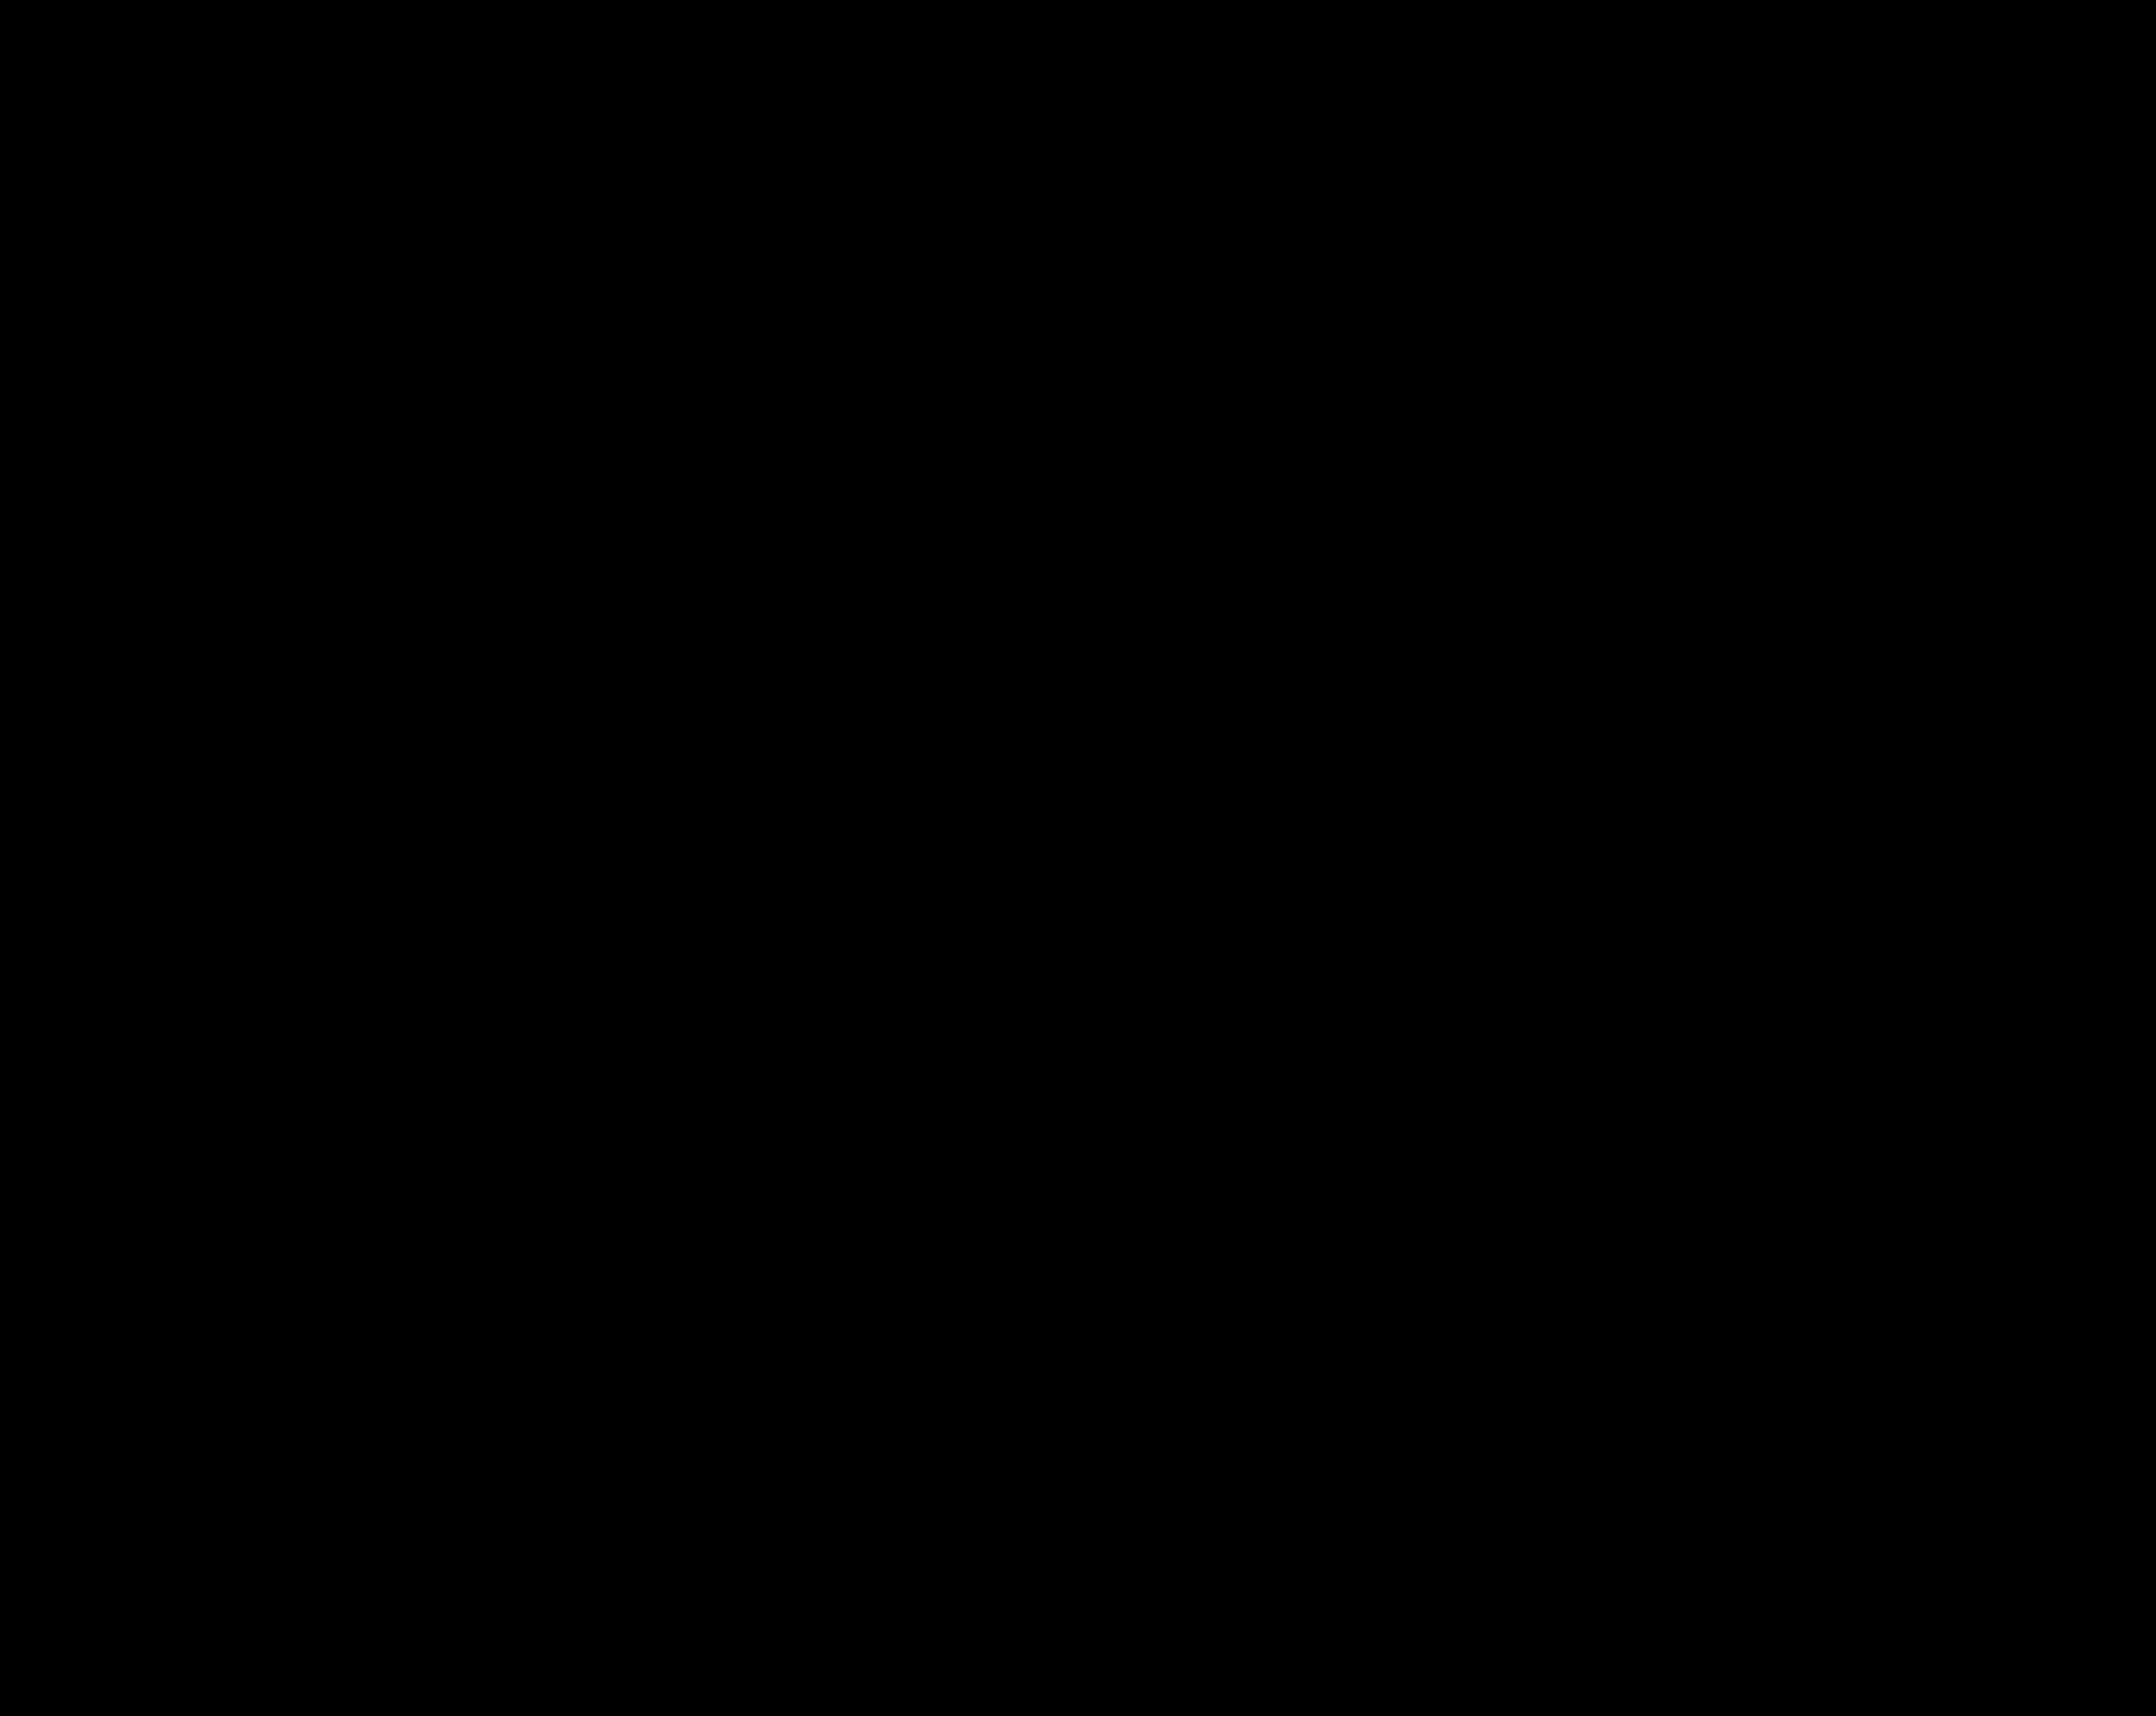 Rosearelli